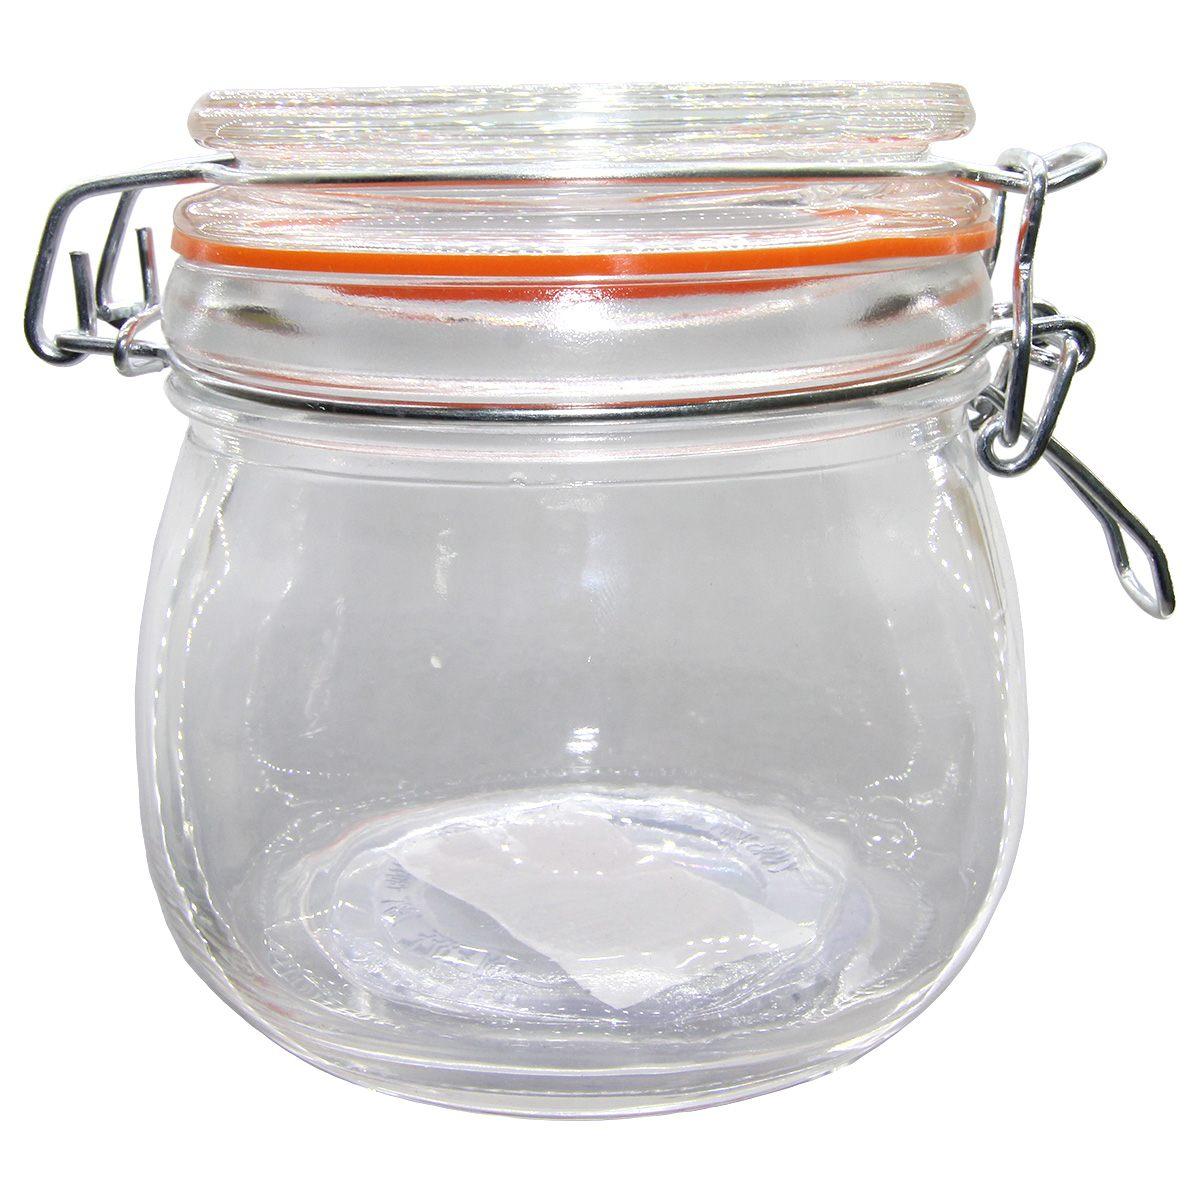 Pote hermético vidro Cancun Color laranja 520ml 11x10cm Lyor